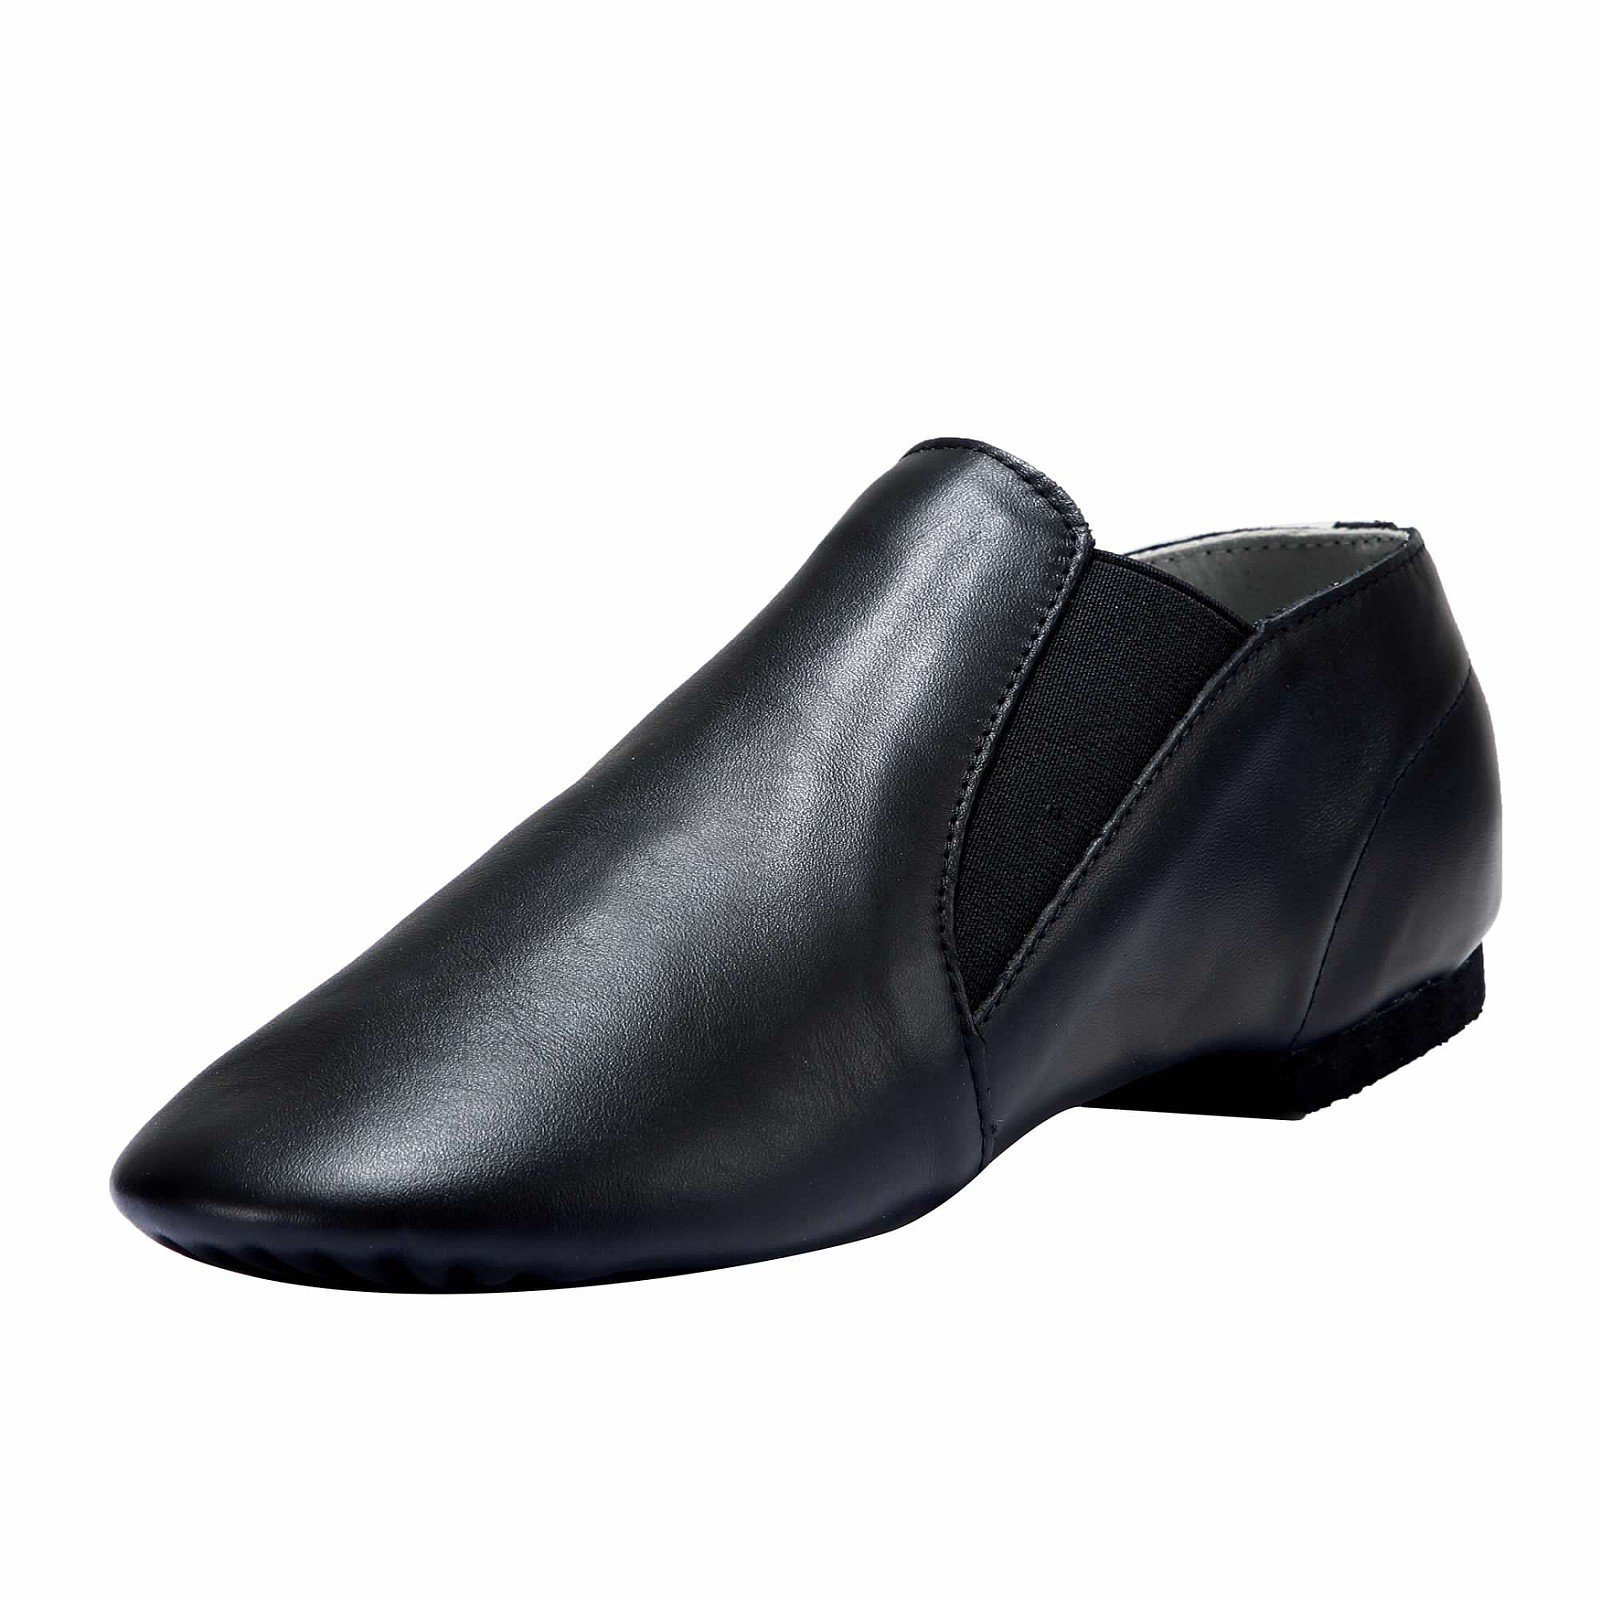 Dynadans Women's Leather Upper Slip-on Jazz Shoe with Elastics Black 4.5M